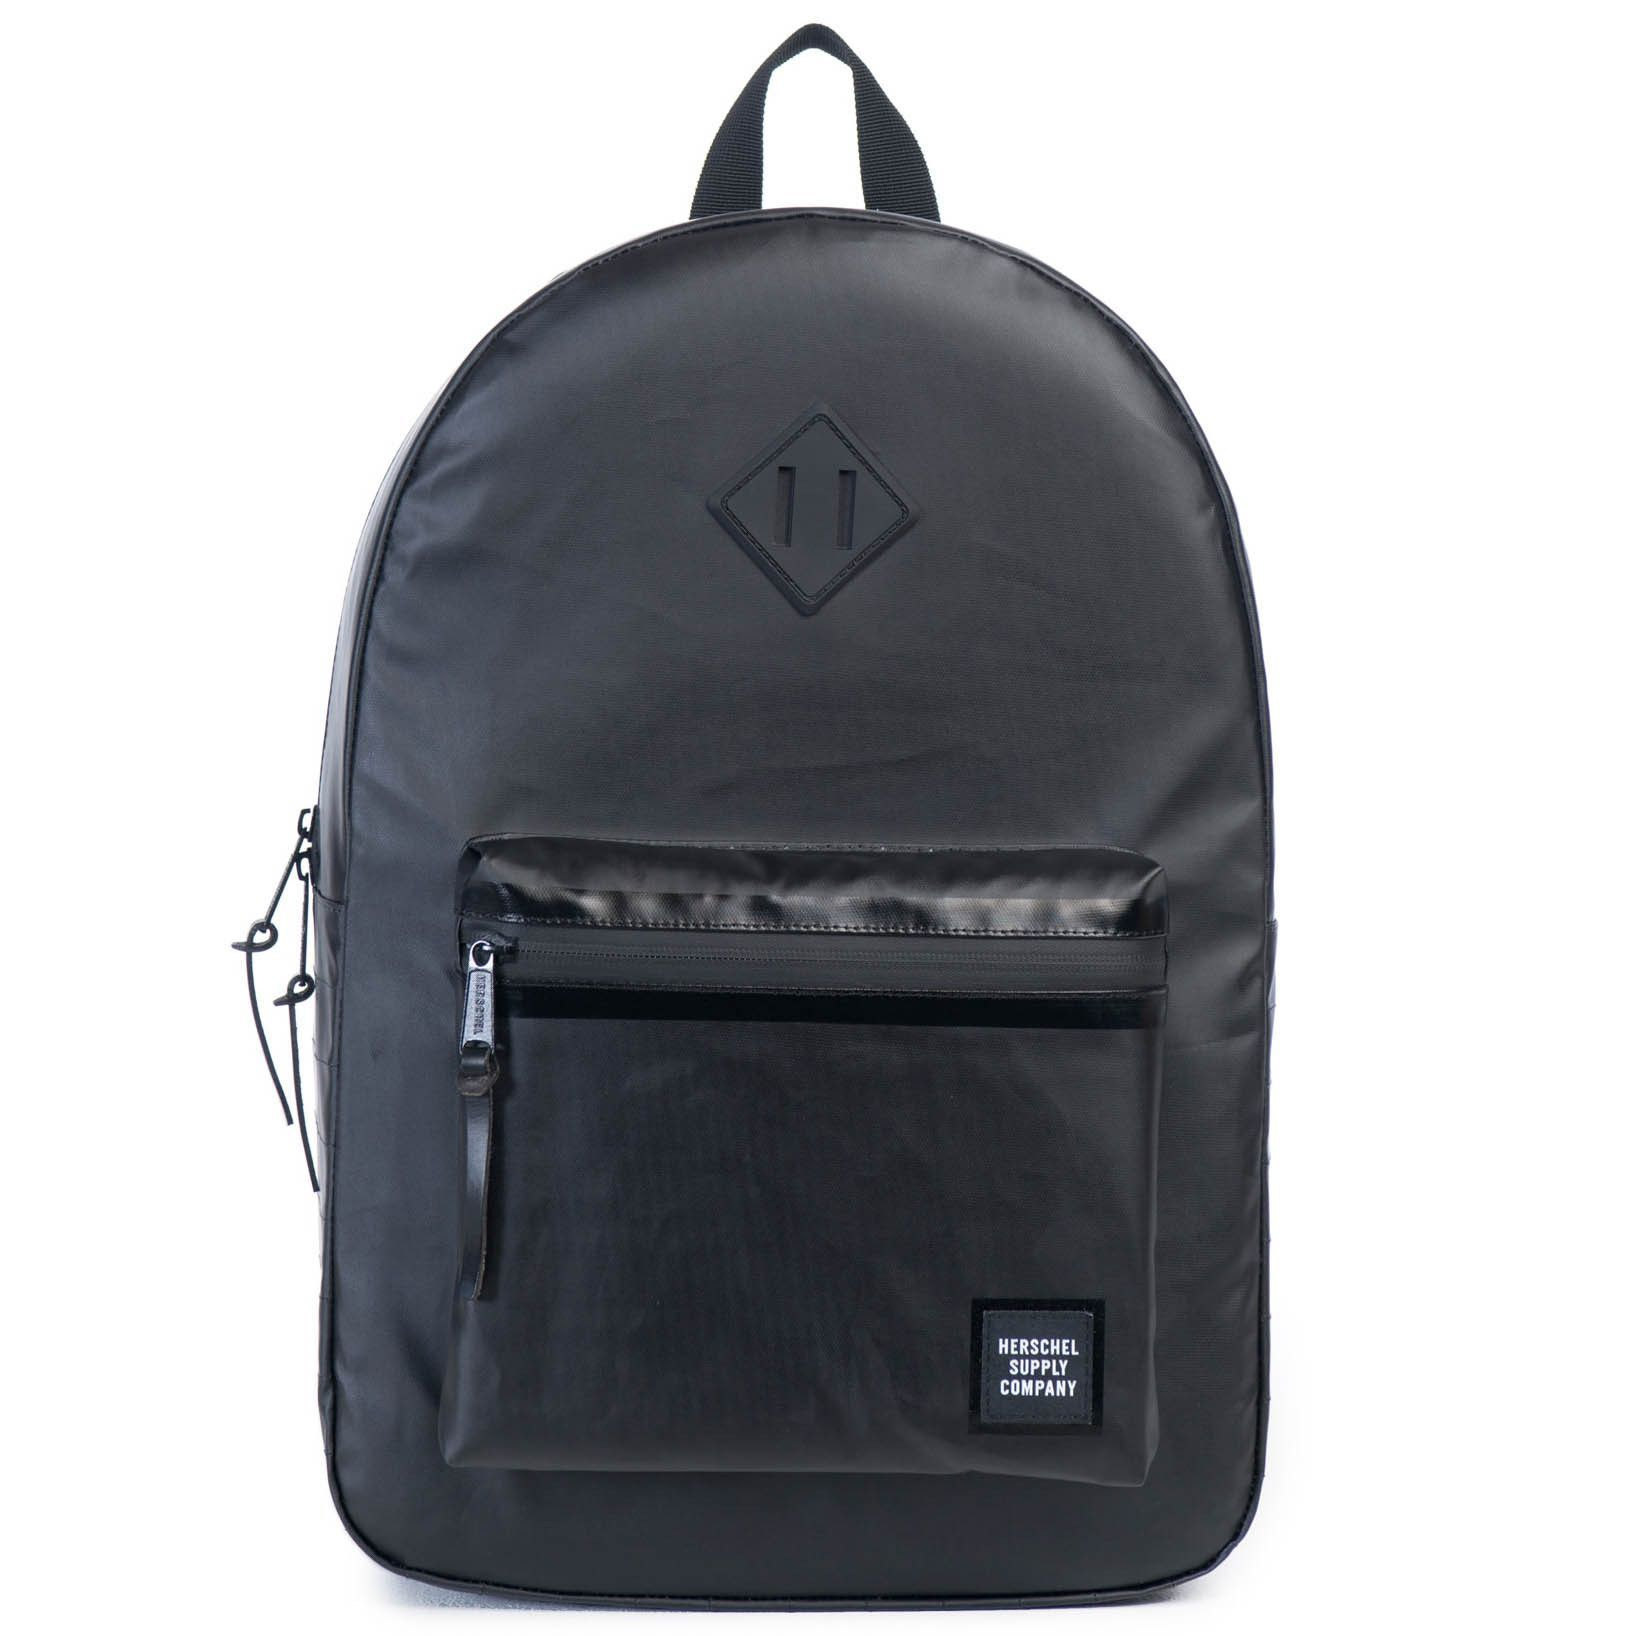 7d9a48e57a Herschel Supply Co. Ruskin Backpack - Black Polycoat